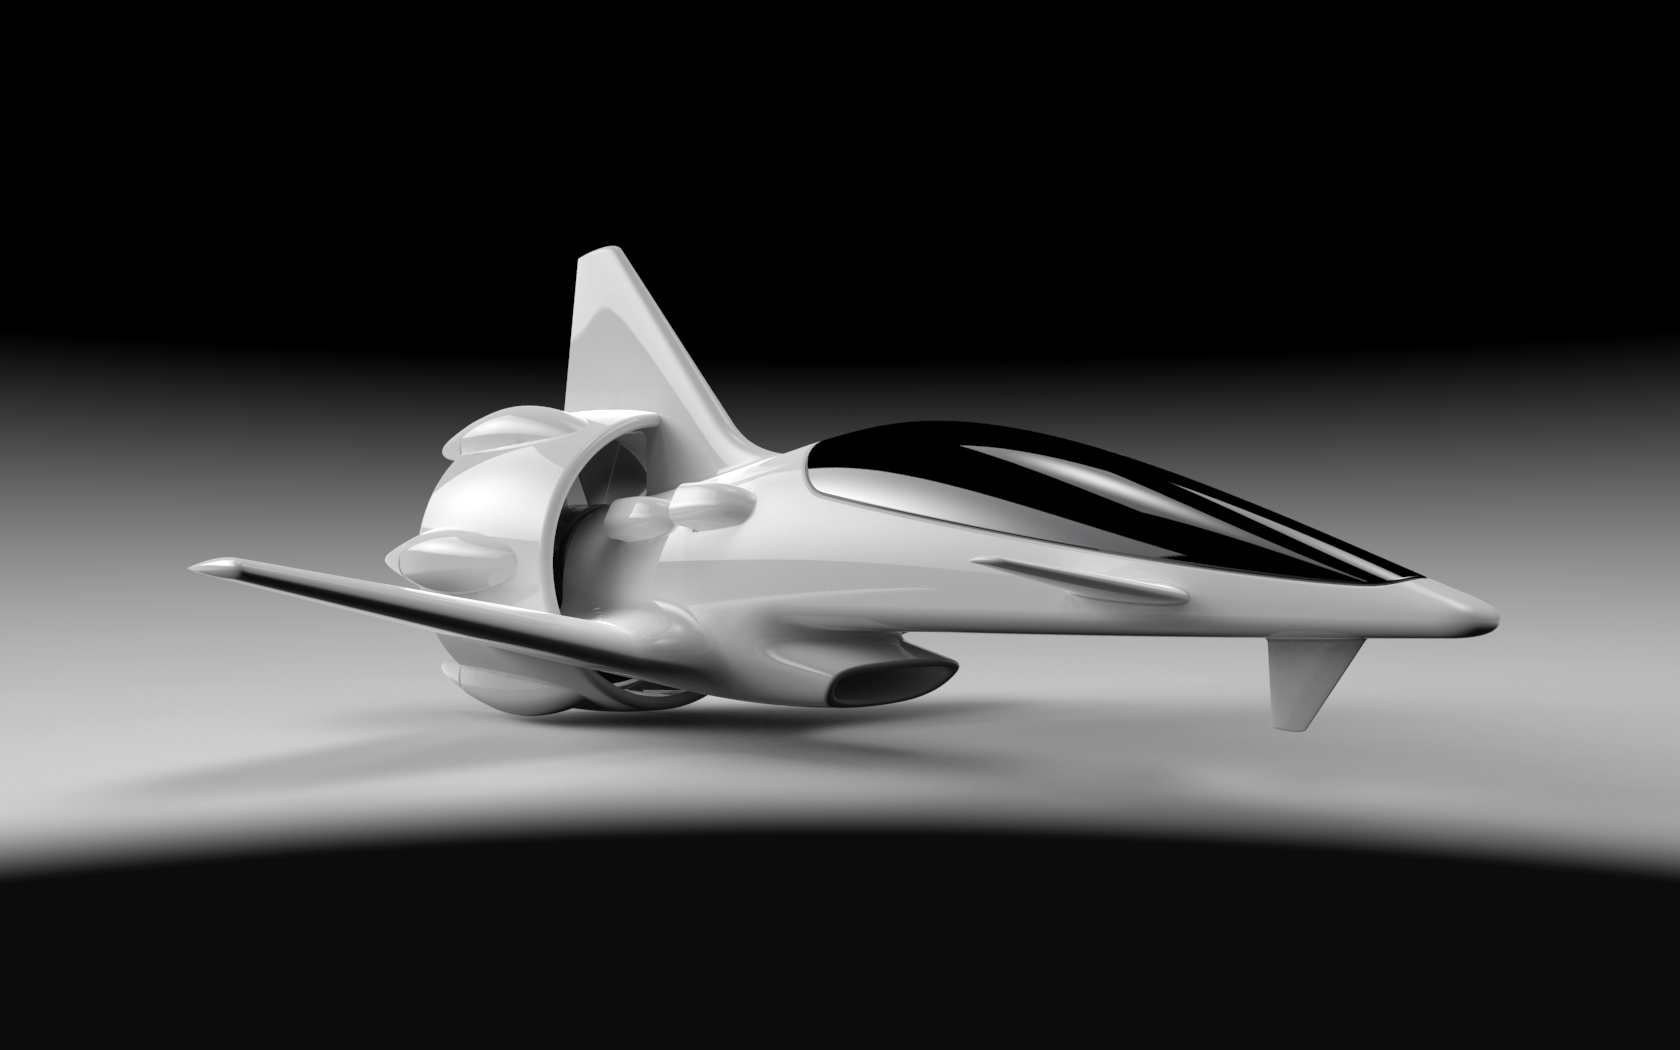 Pegasus PE-210 A (primer avion atctual de origen mexicano)(prototipo) Wip_macross_fanracer_by_zpaolo-d60dklh